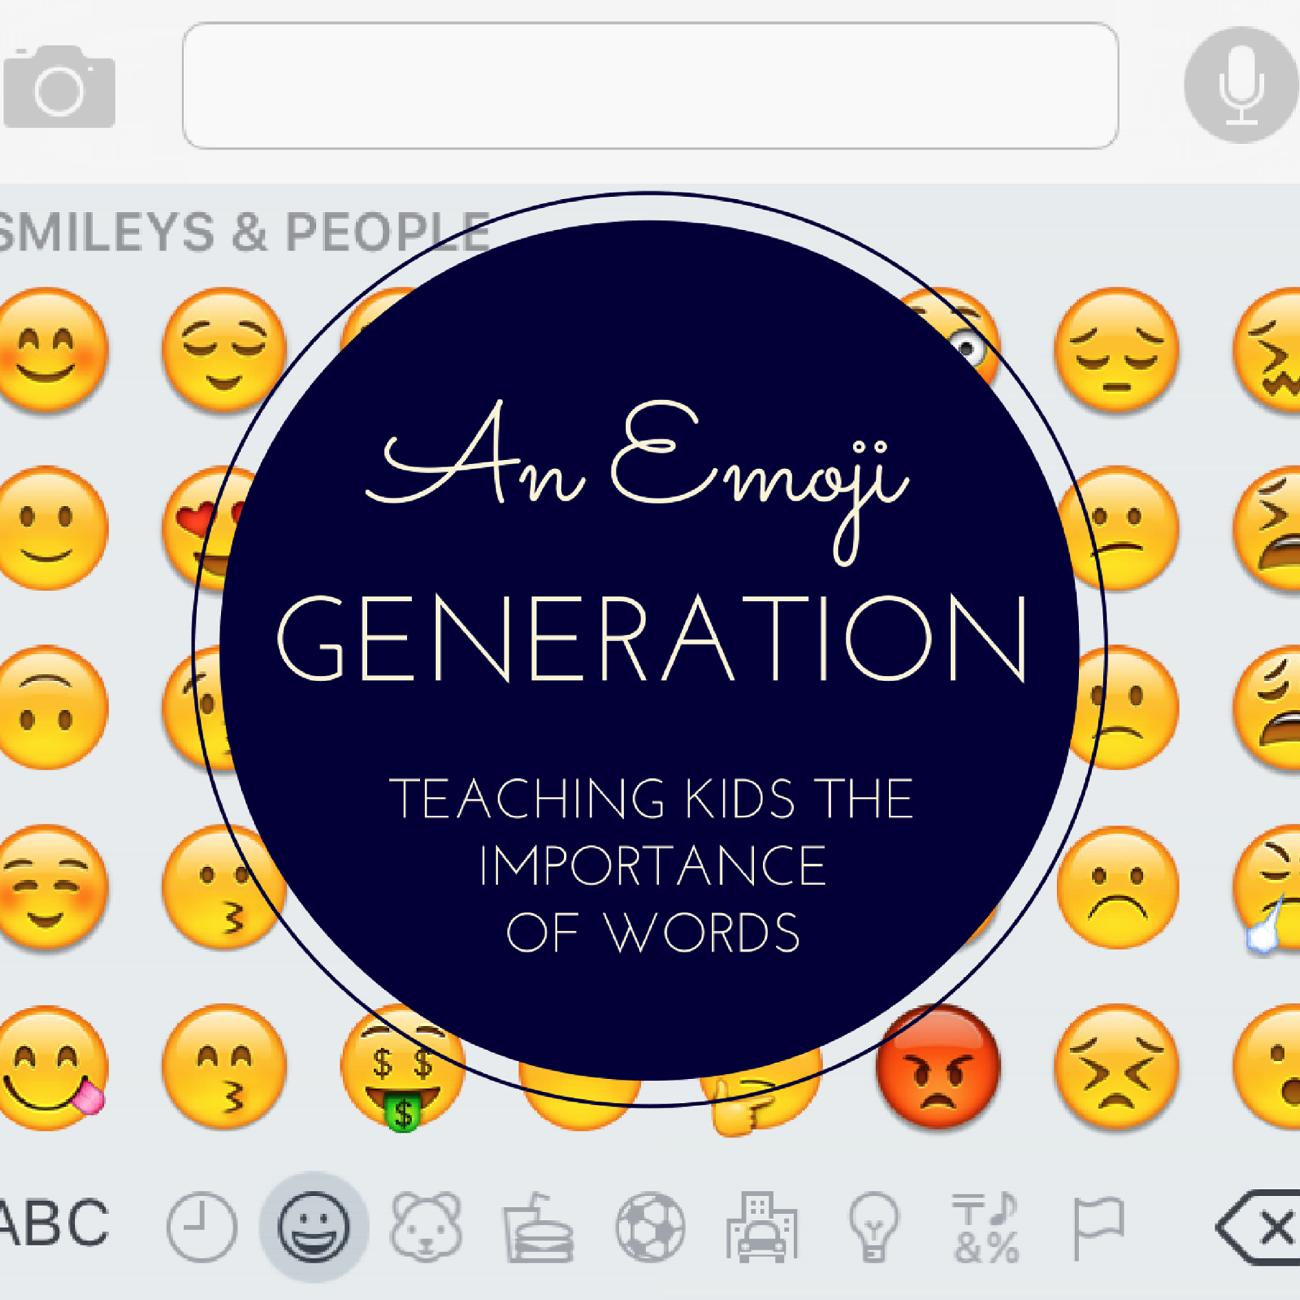 emoji_generation.png